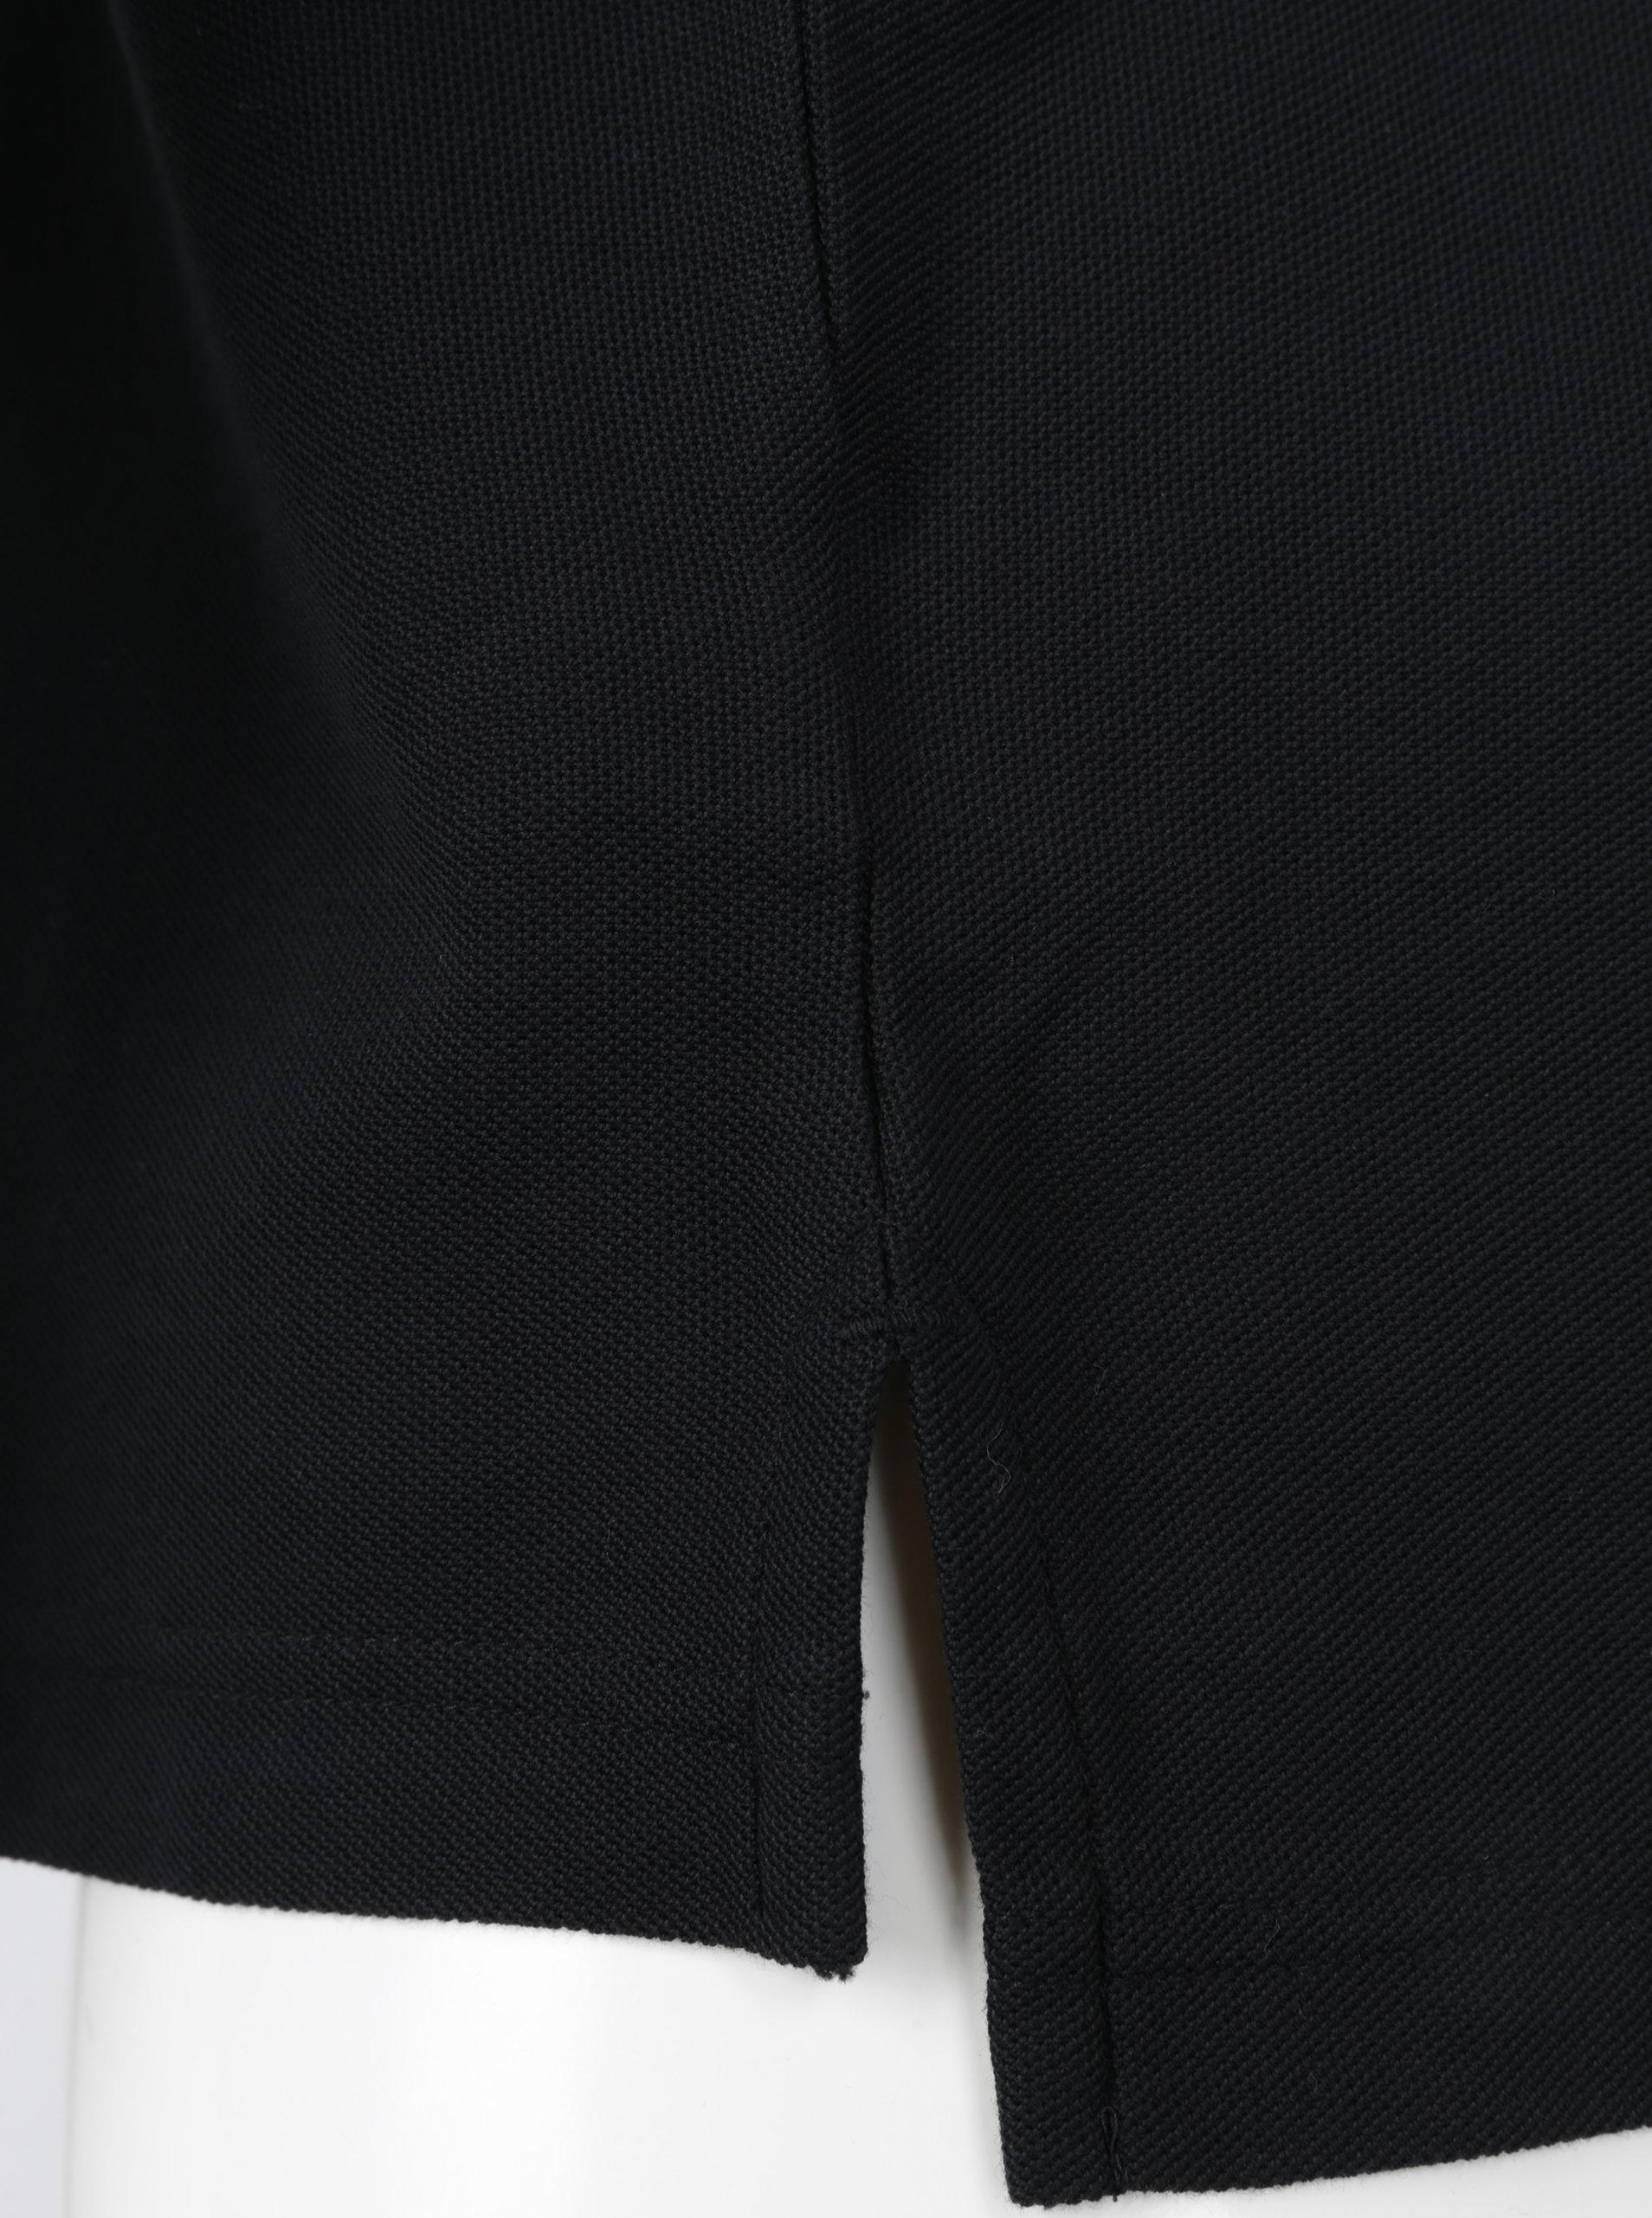 Čierna pánska regular fit polokošeľa Tommy Hilfiger ... a2bbde529a8